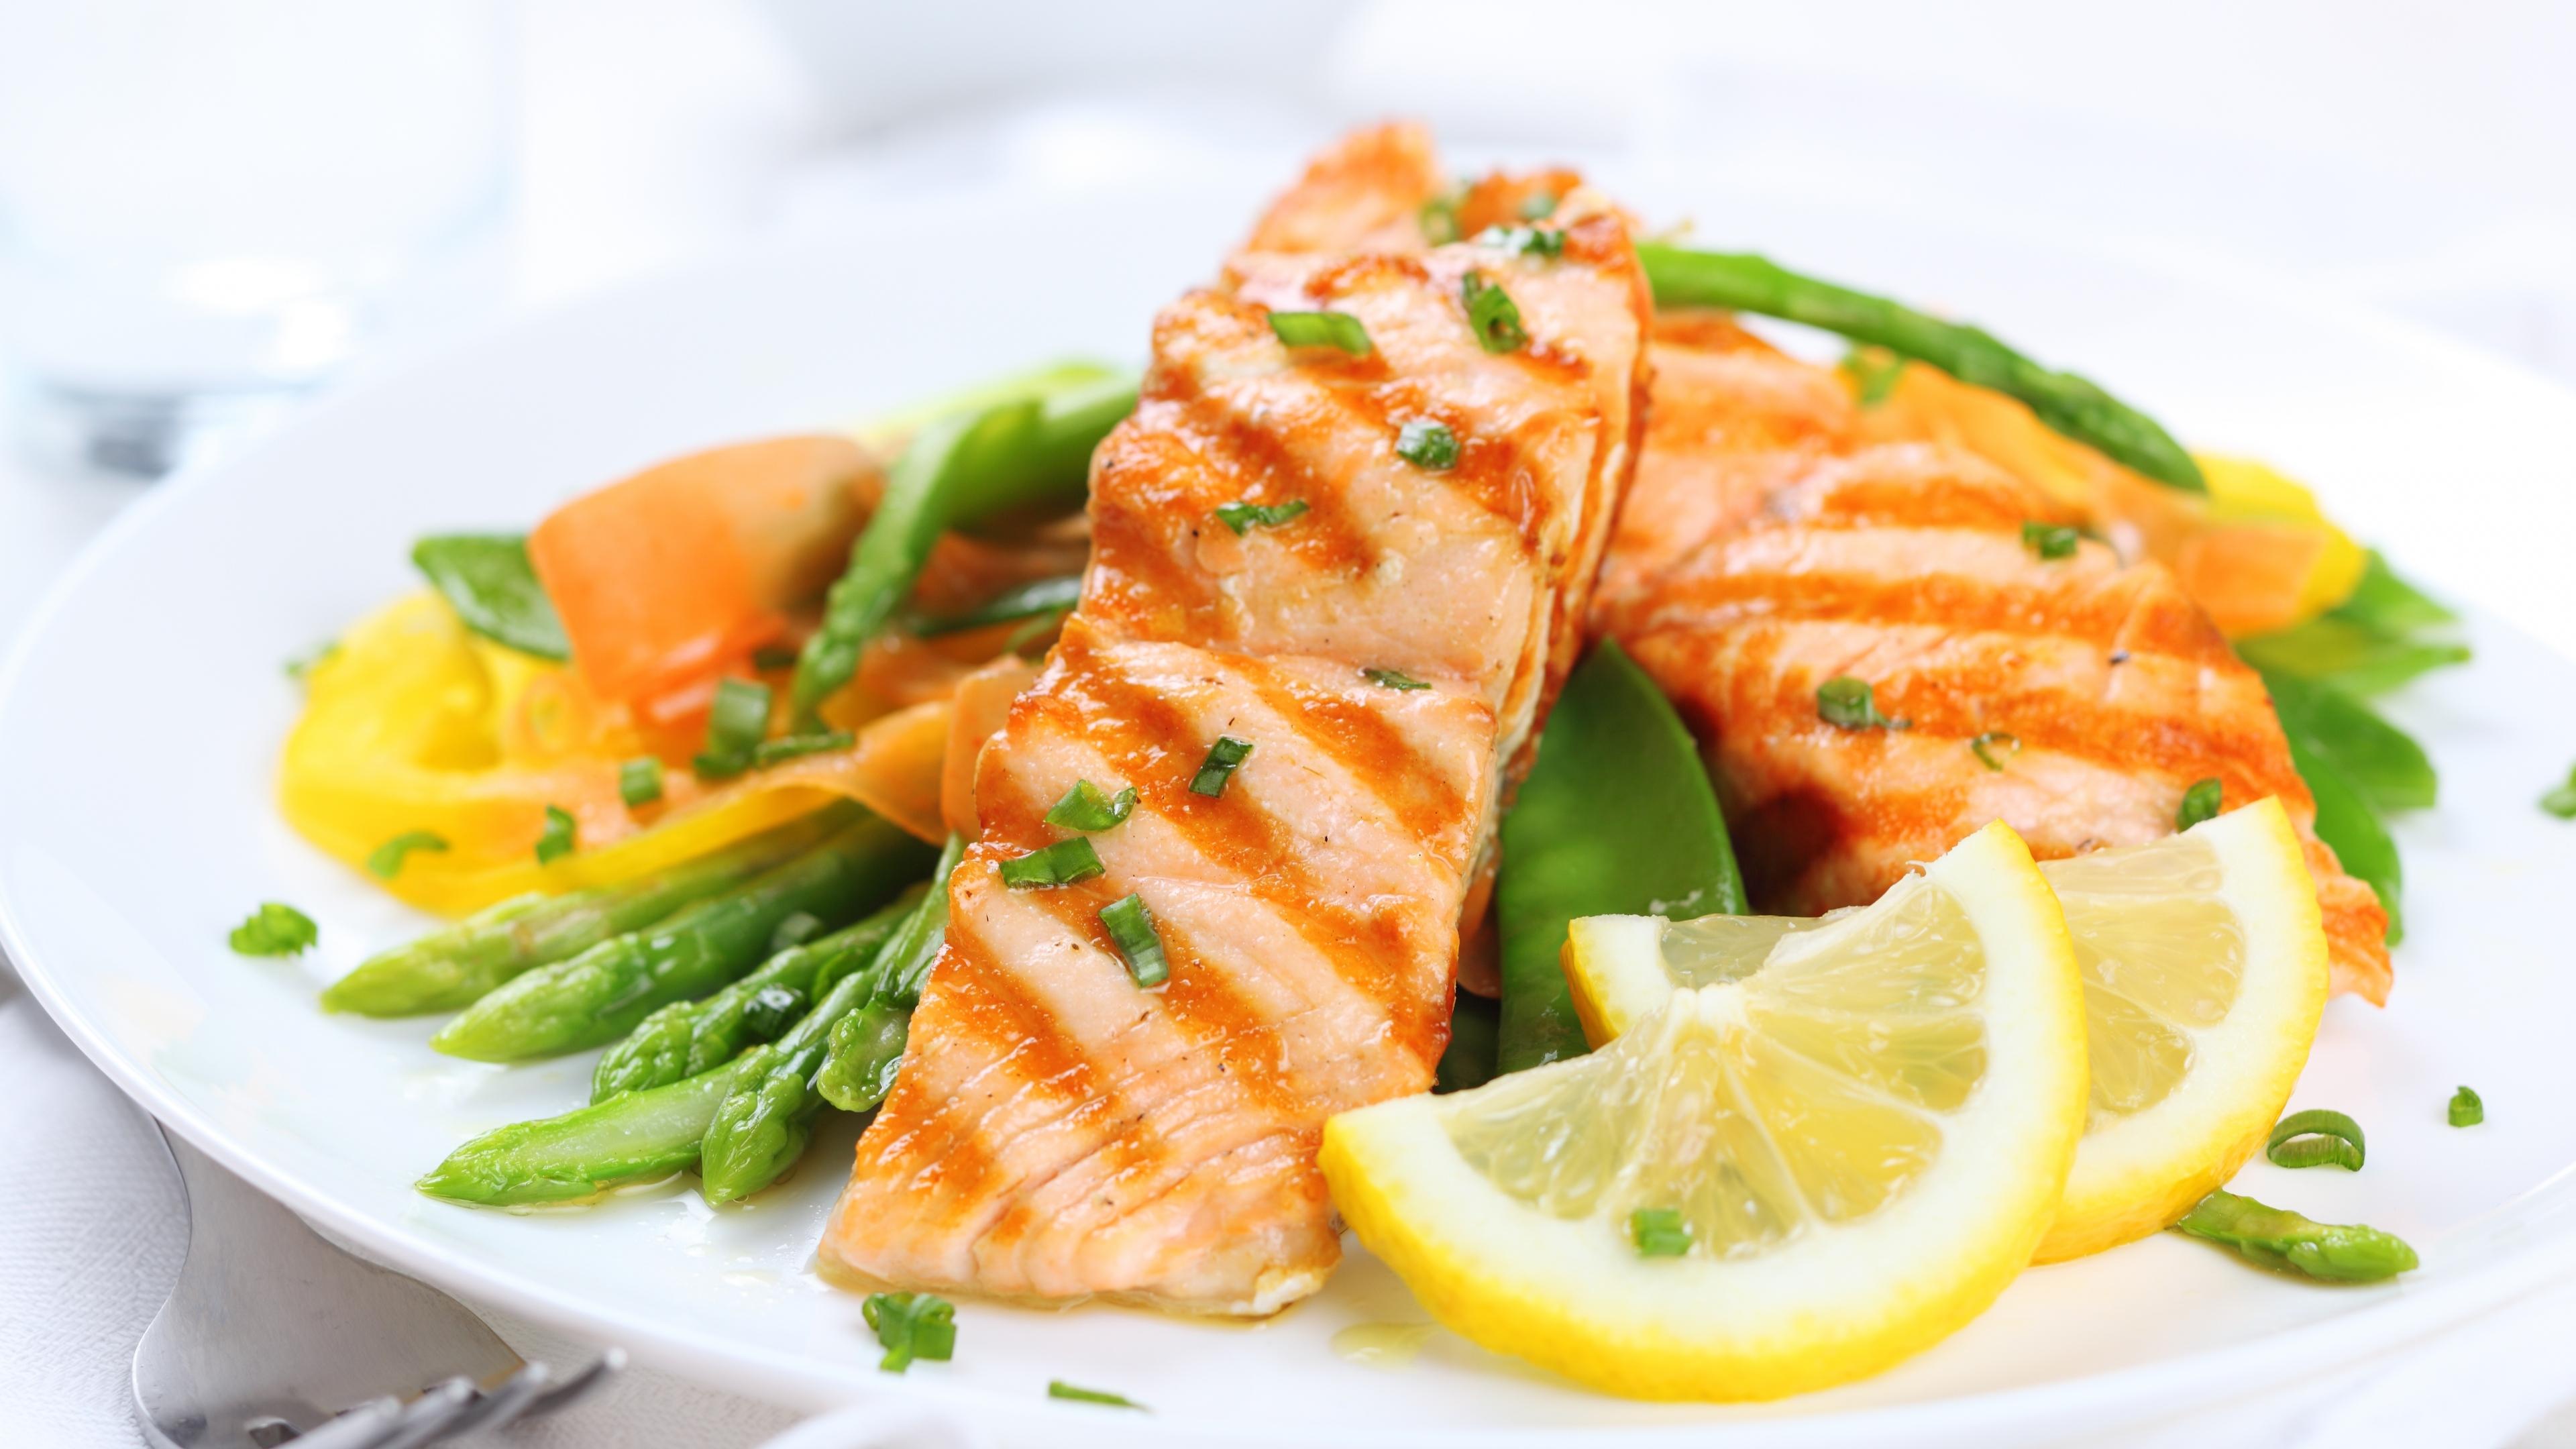 fruit_vegetables_fish_garnish_lemon_food_74301_3840x2160.jpg